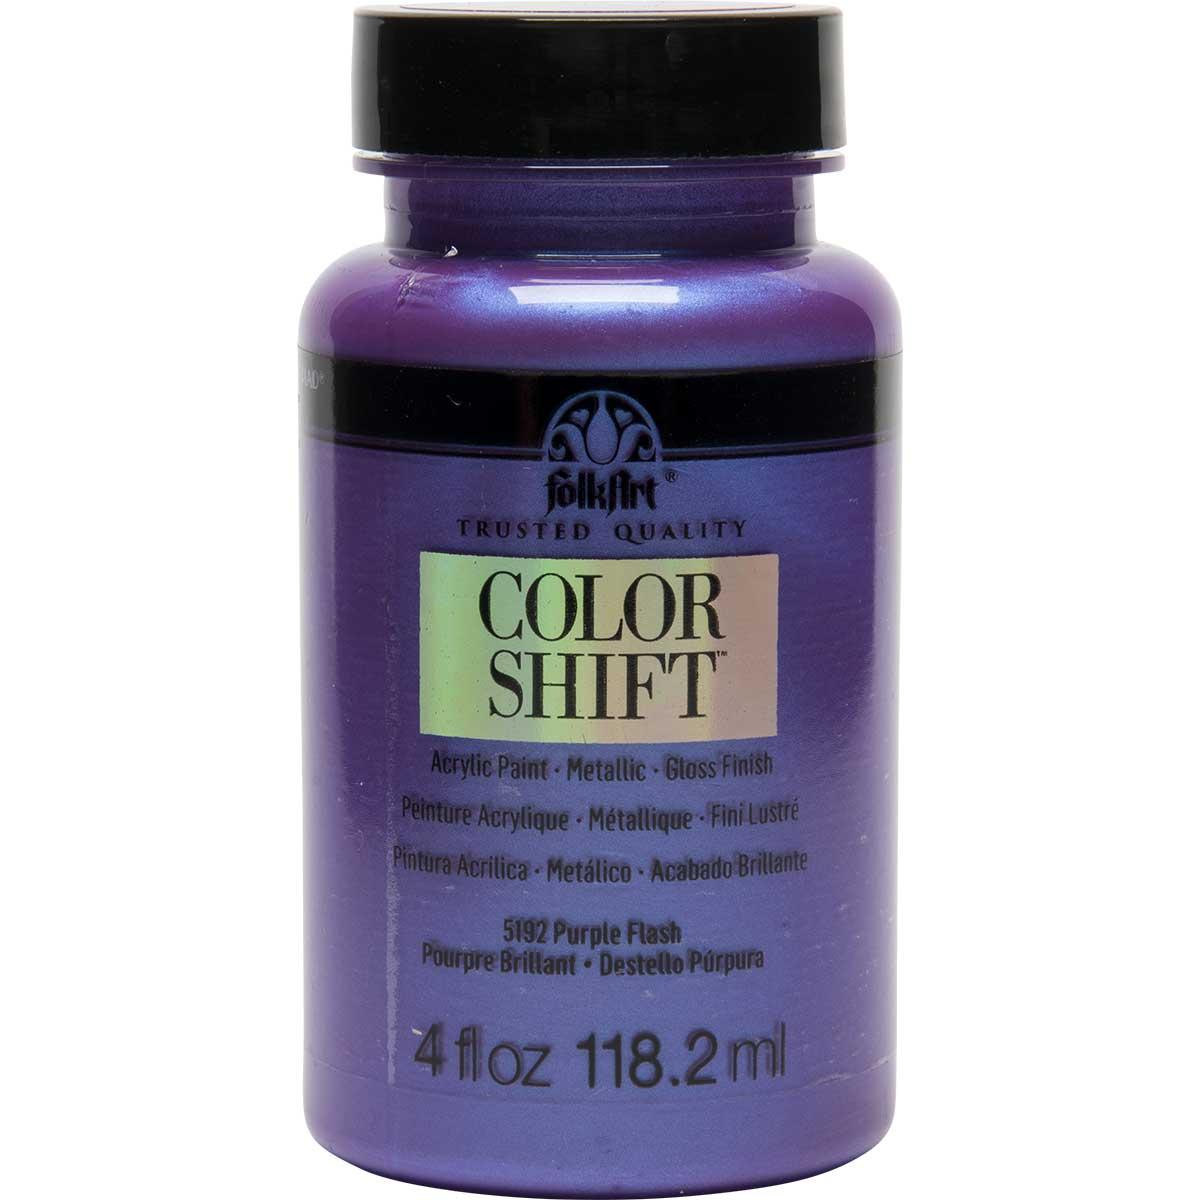 FolkArt ® Color Shift™ Acrylic Paint - Purple Flash, 4 oz.